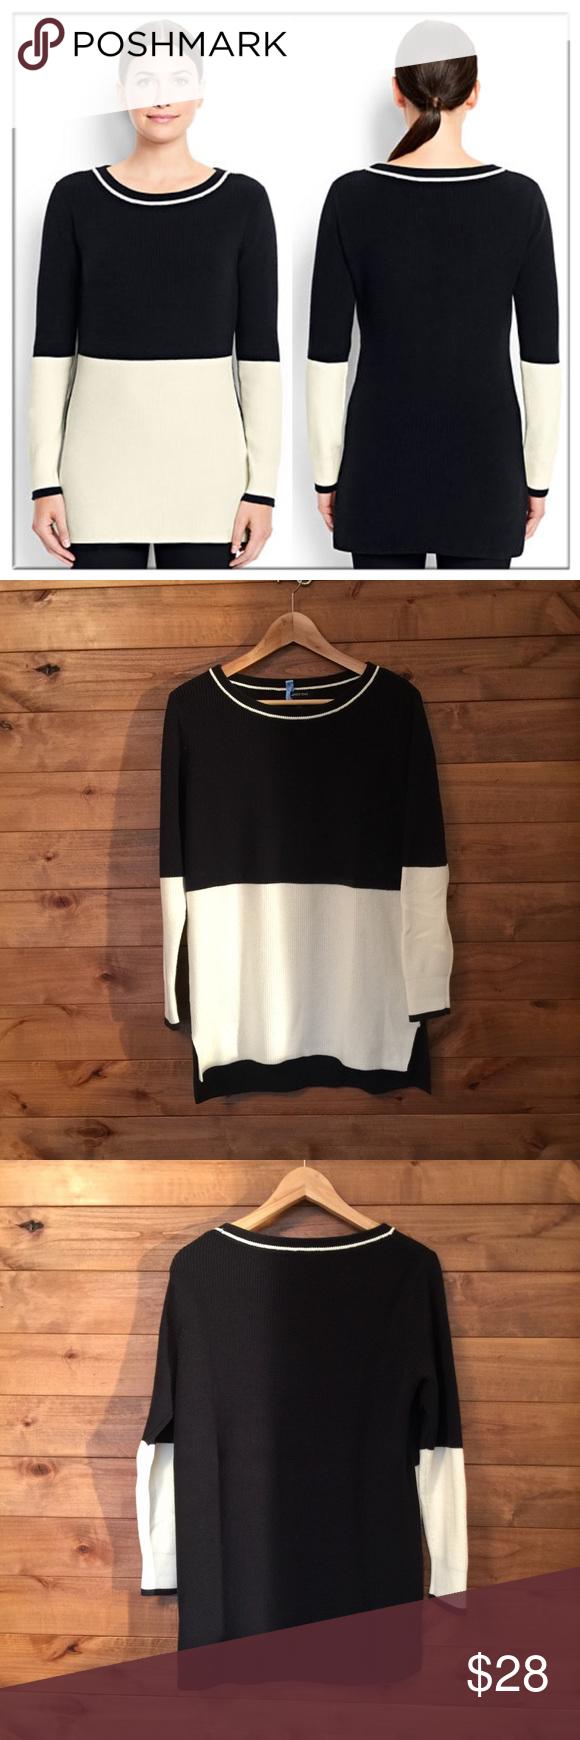 Lands End Colorblock Tunic Sweater Clothes Design Fashion Design Fashion [ 1740 x 580 Pixel ]